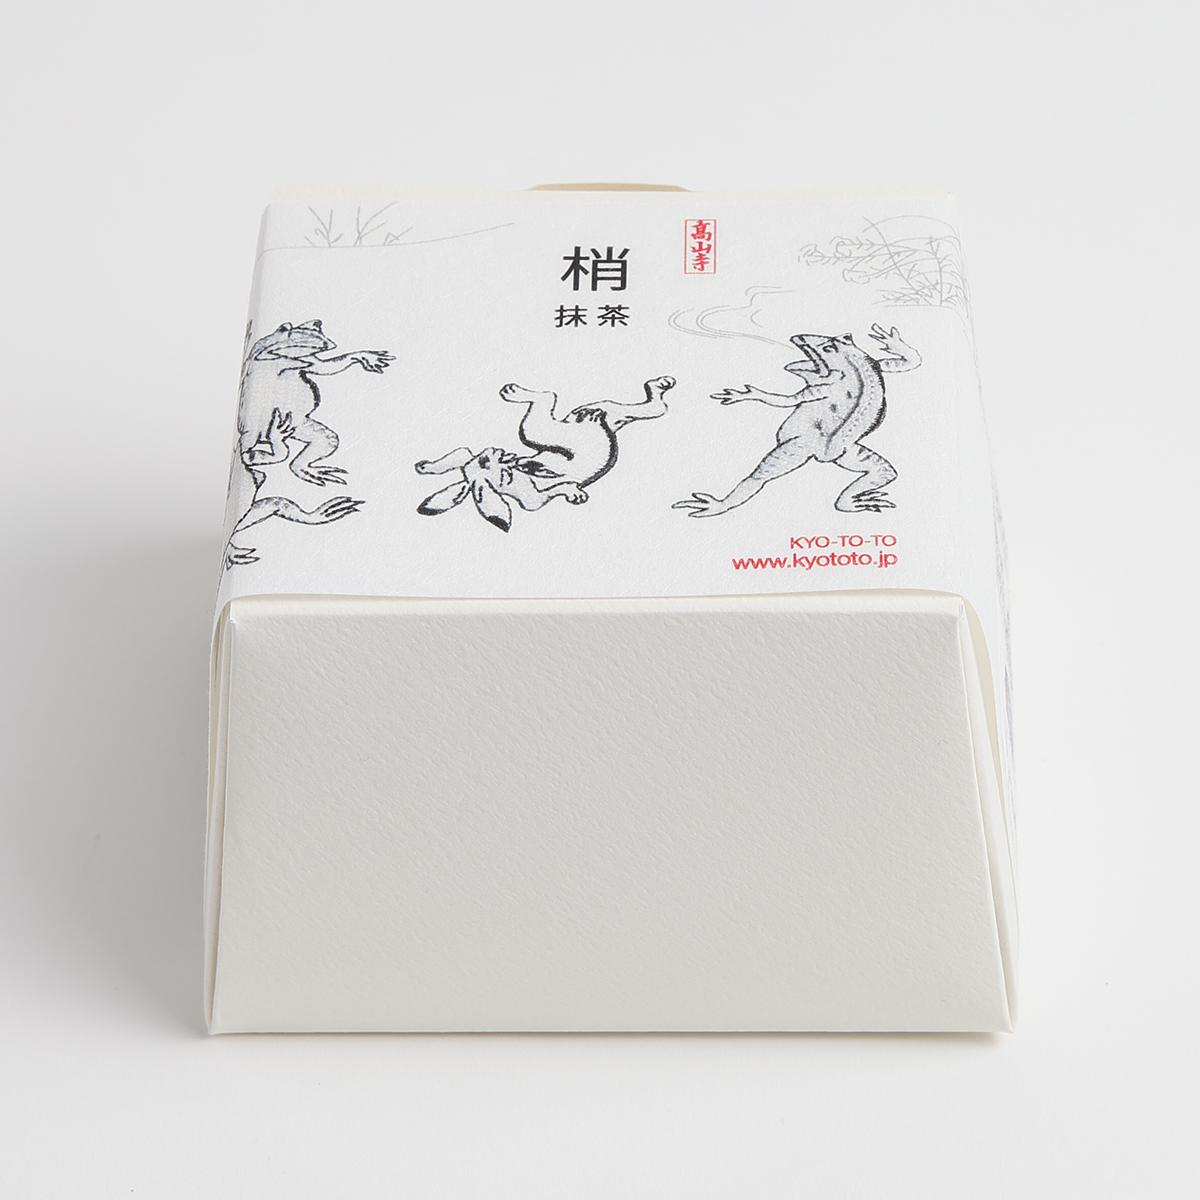 KY03-881M/チョコレート菓子/抹茶